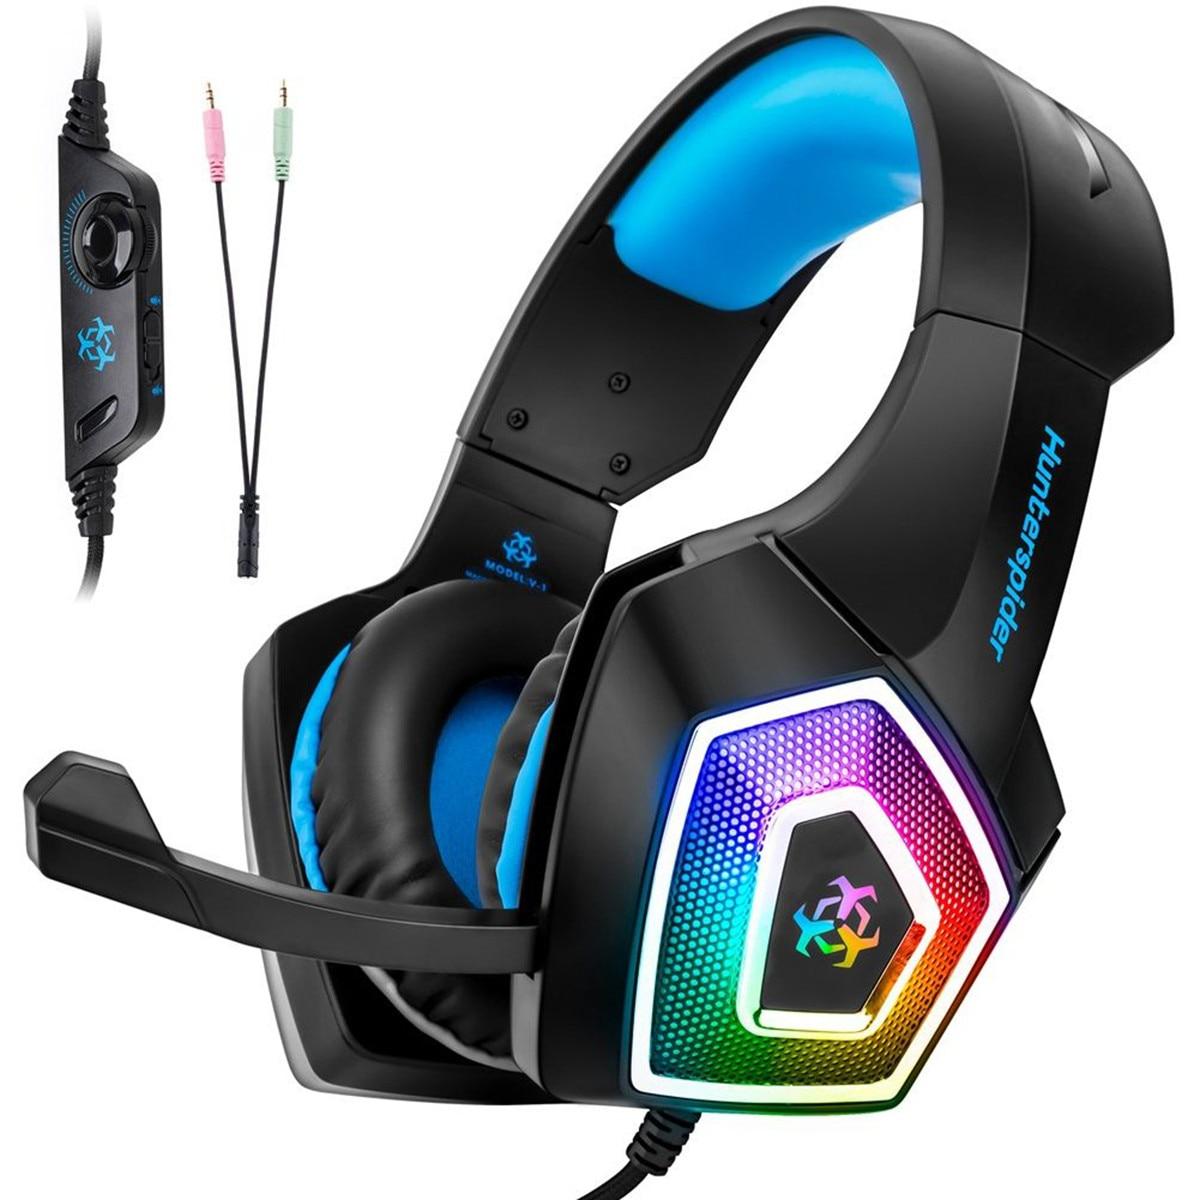 hunterspider v1 wired gaming headset 7 color led lights low distortion with mute button volume. Black Bedroom Furniture Sets. Home Design Ideas